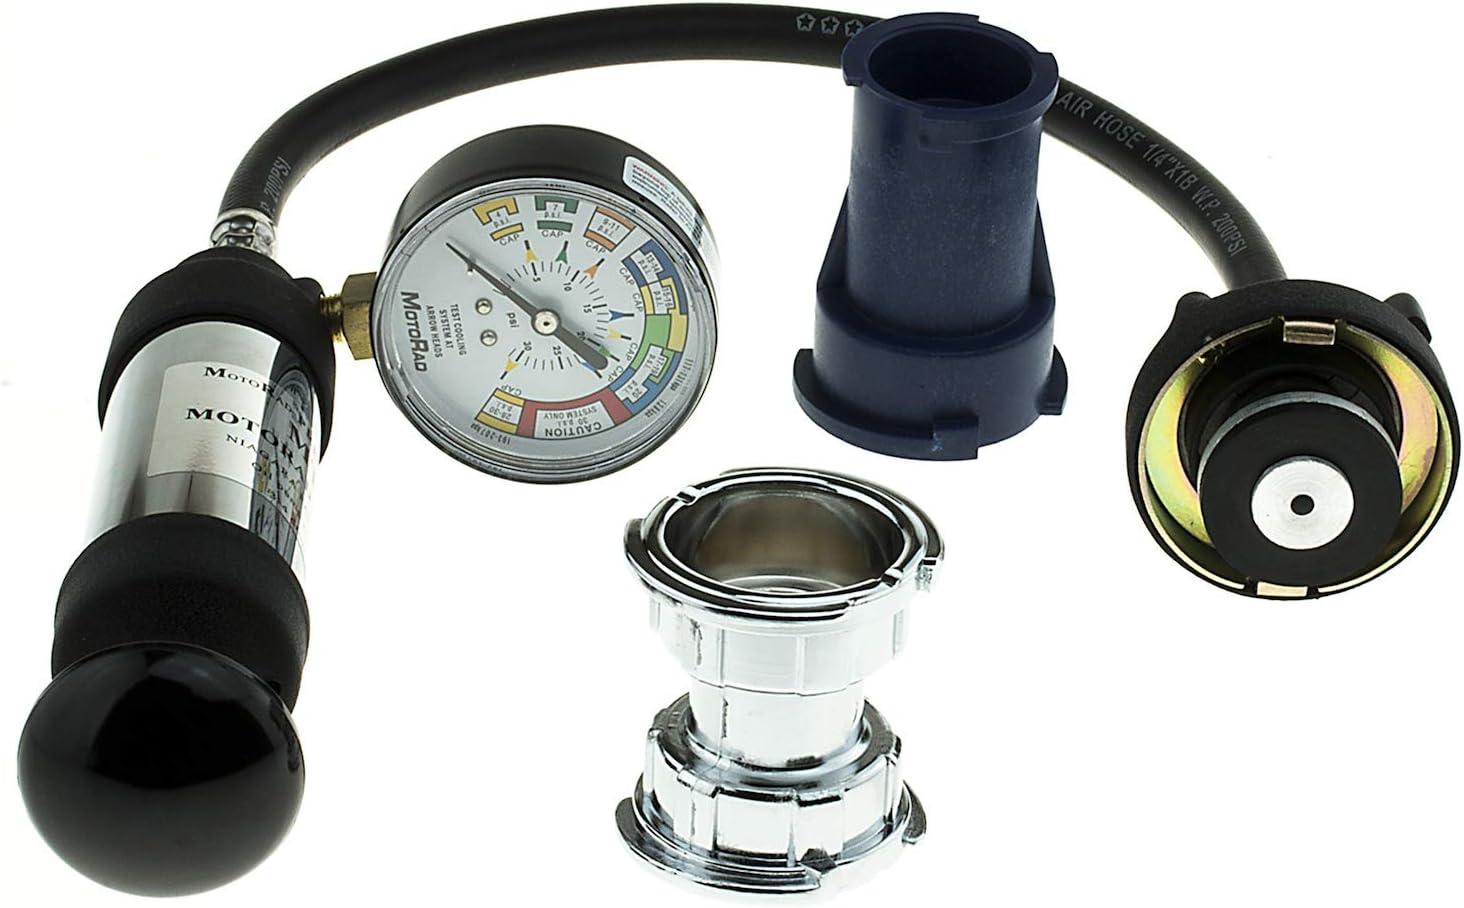 12270//12255 Cooling System Tester with 1 Filler Necks Stant 12559 Rubber Spacer for